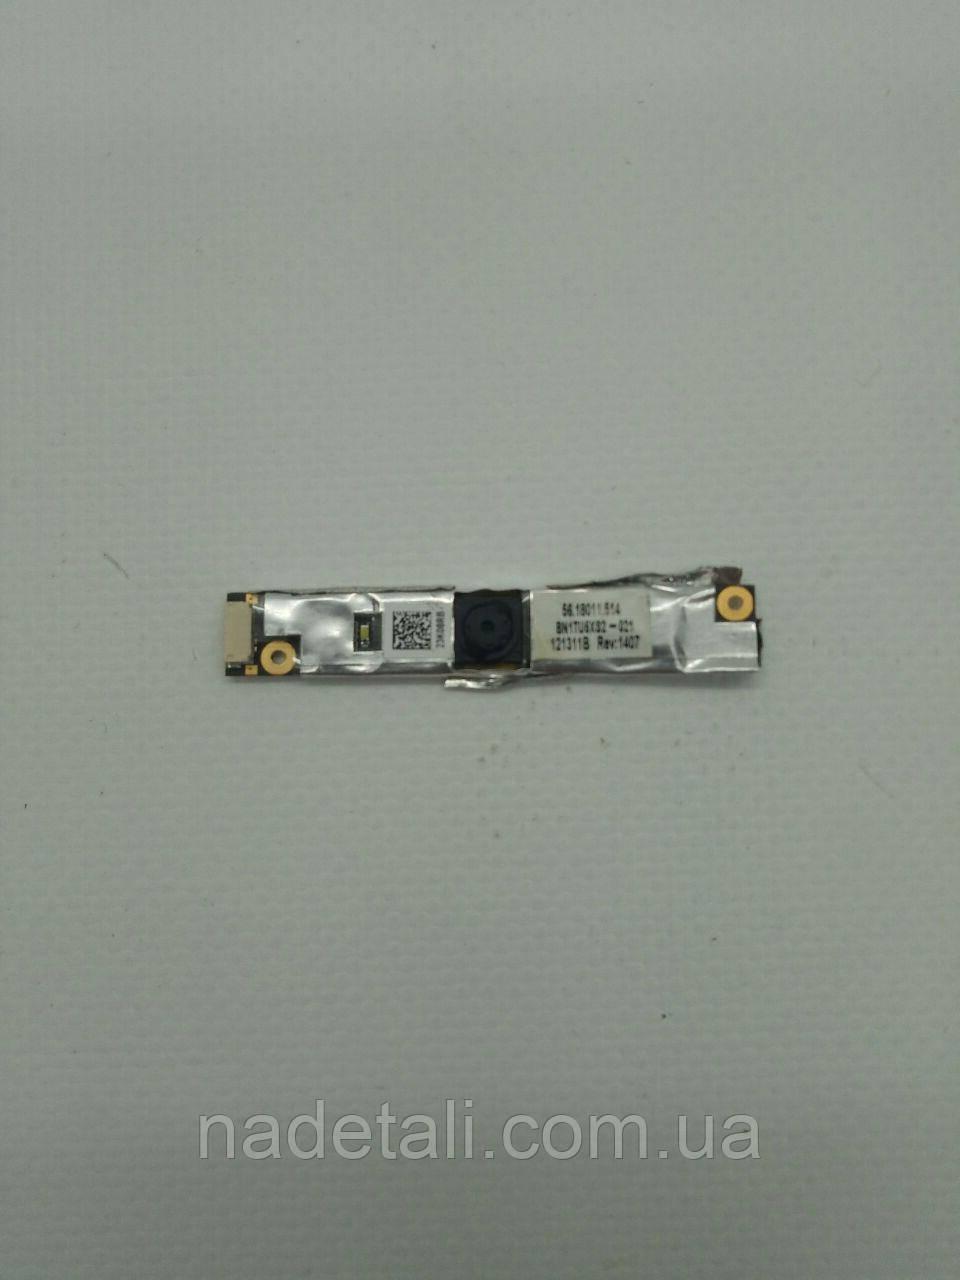 Веб-камера Lenovo V570 BN1TU5XS2-021 56.18011.514